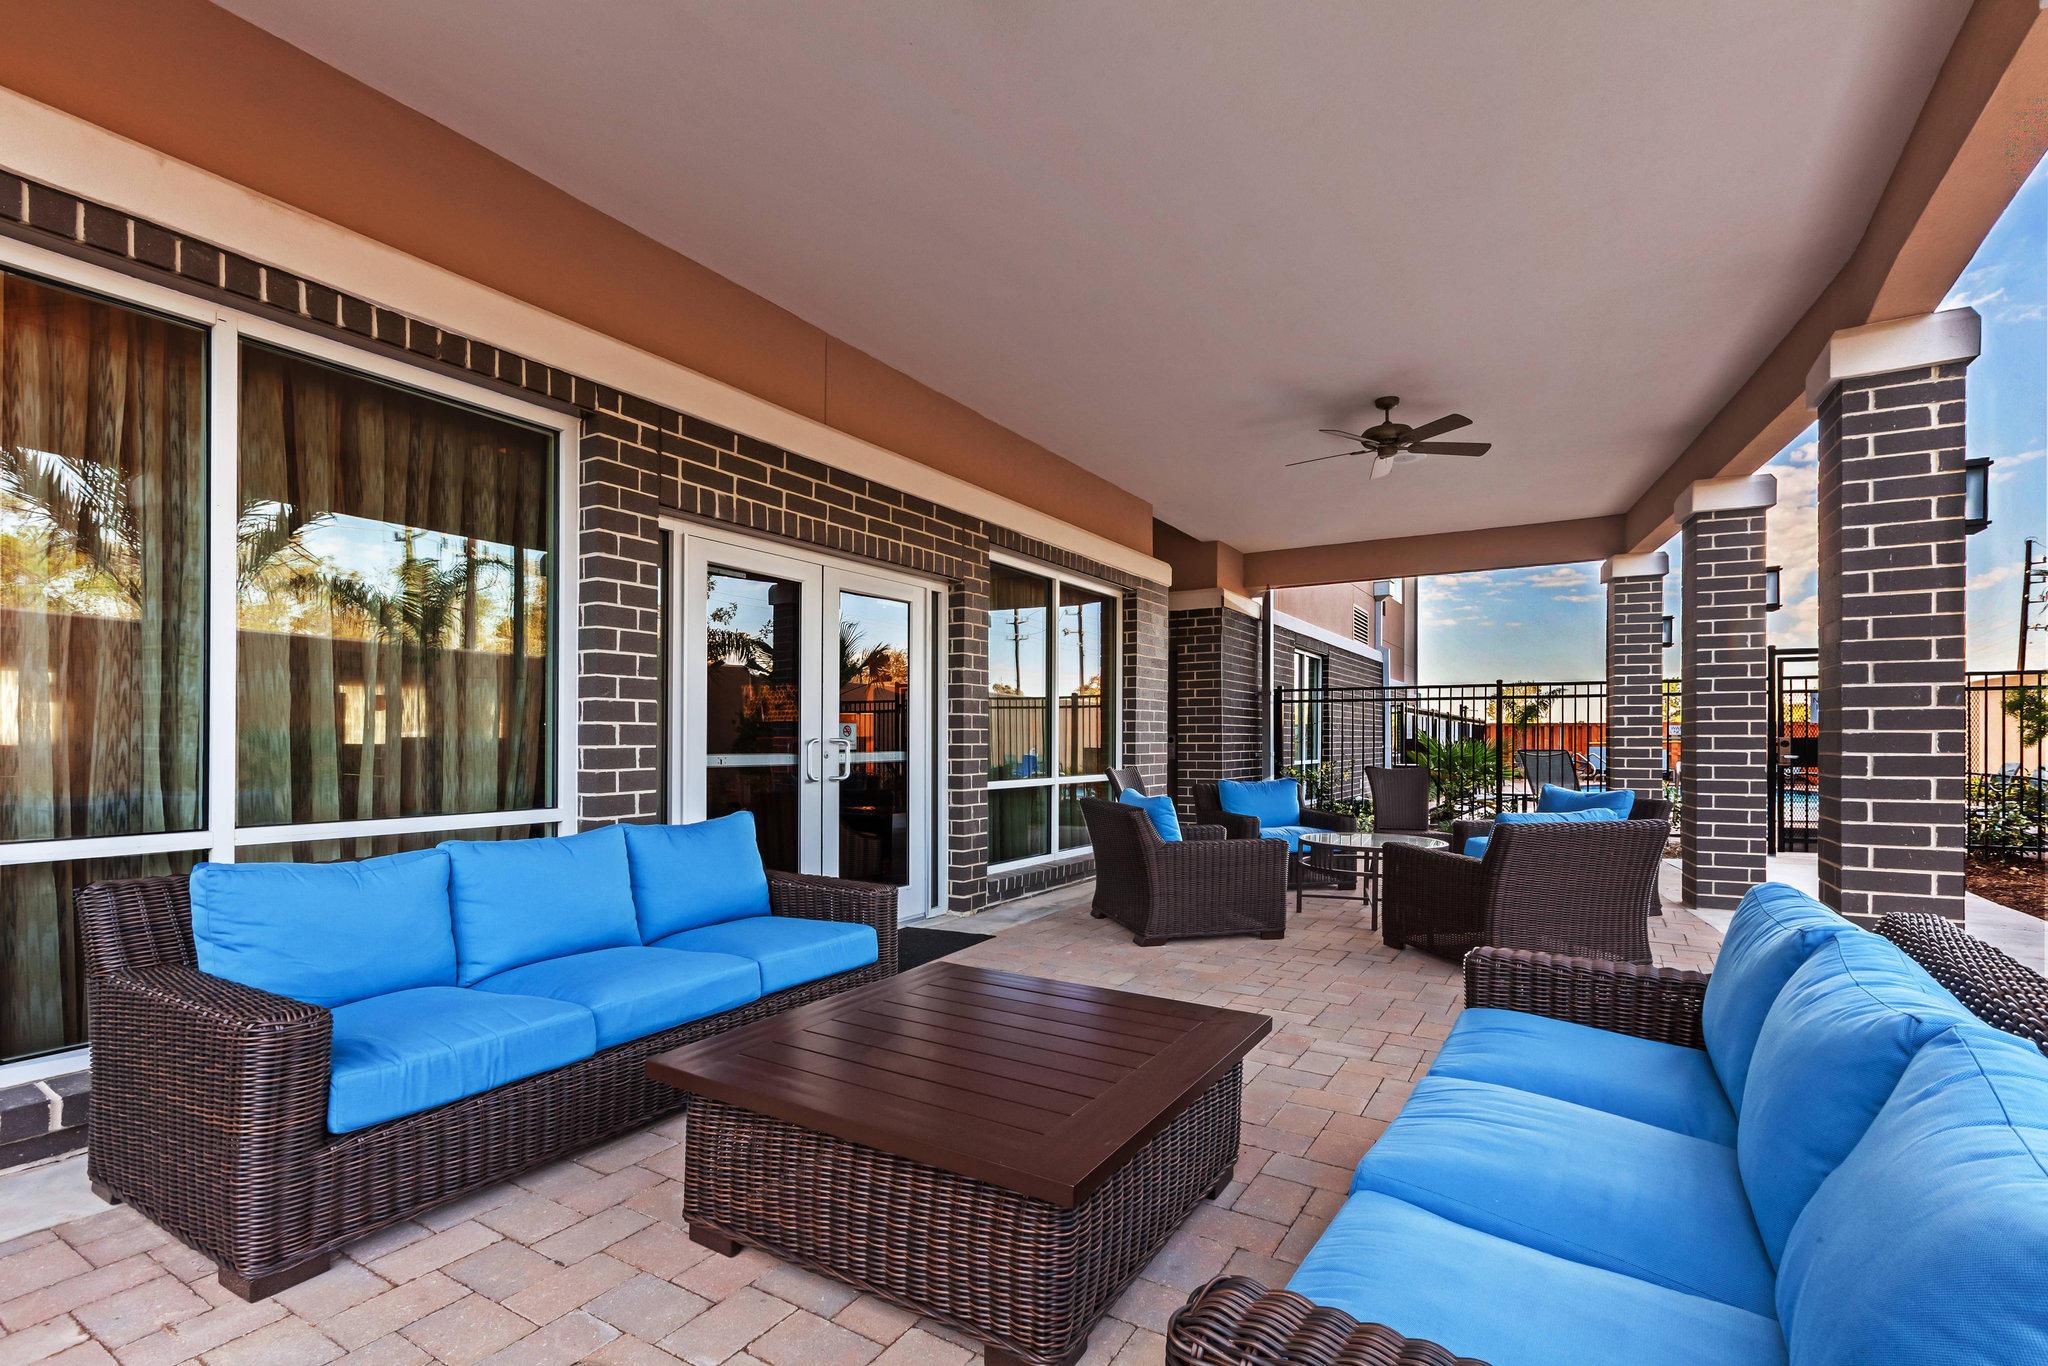 Courtyard by Marriott Houston I-10 West/Park Row